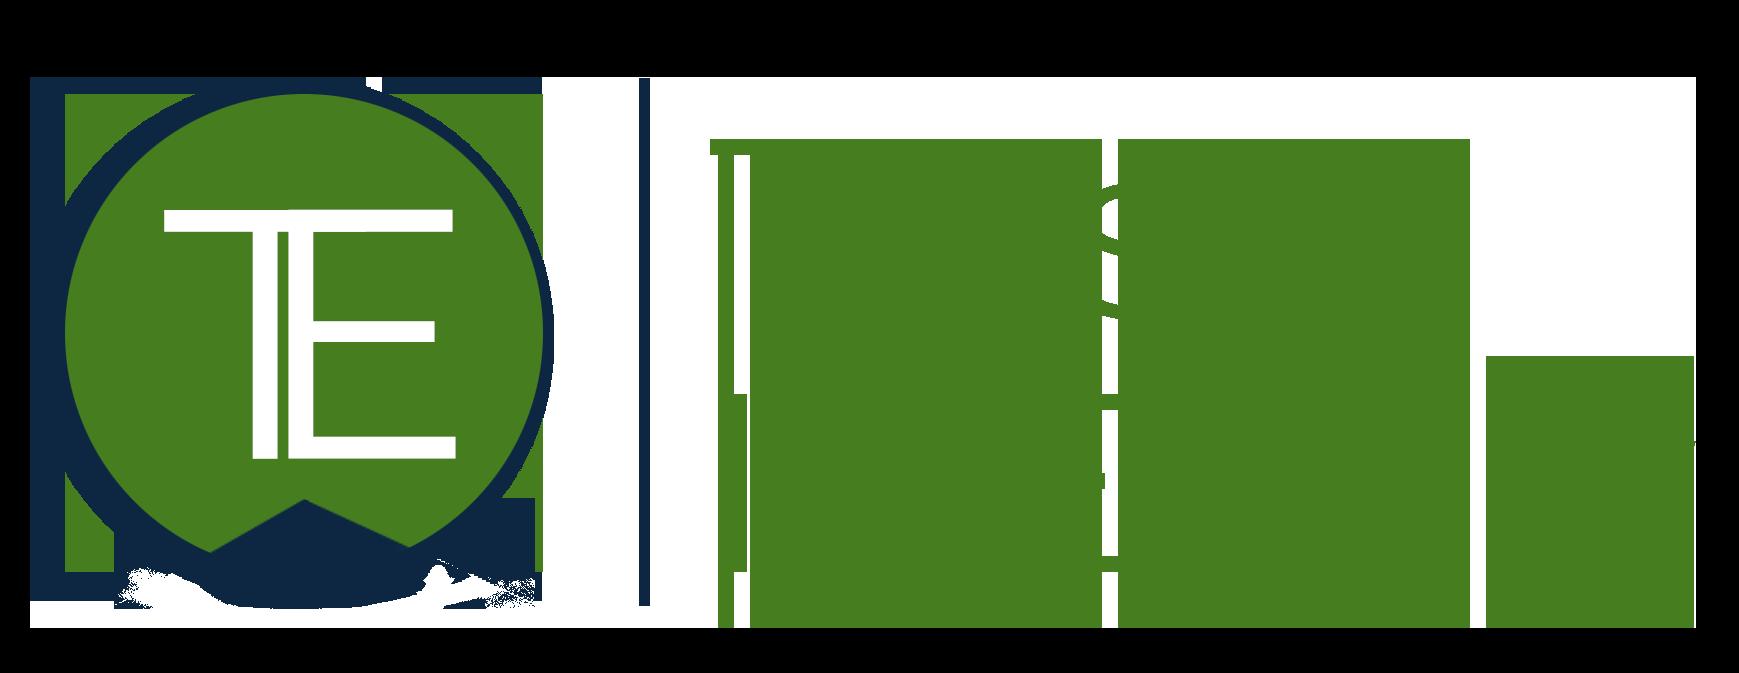 Trust in Equity